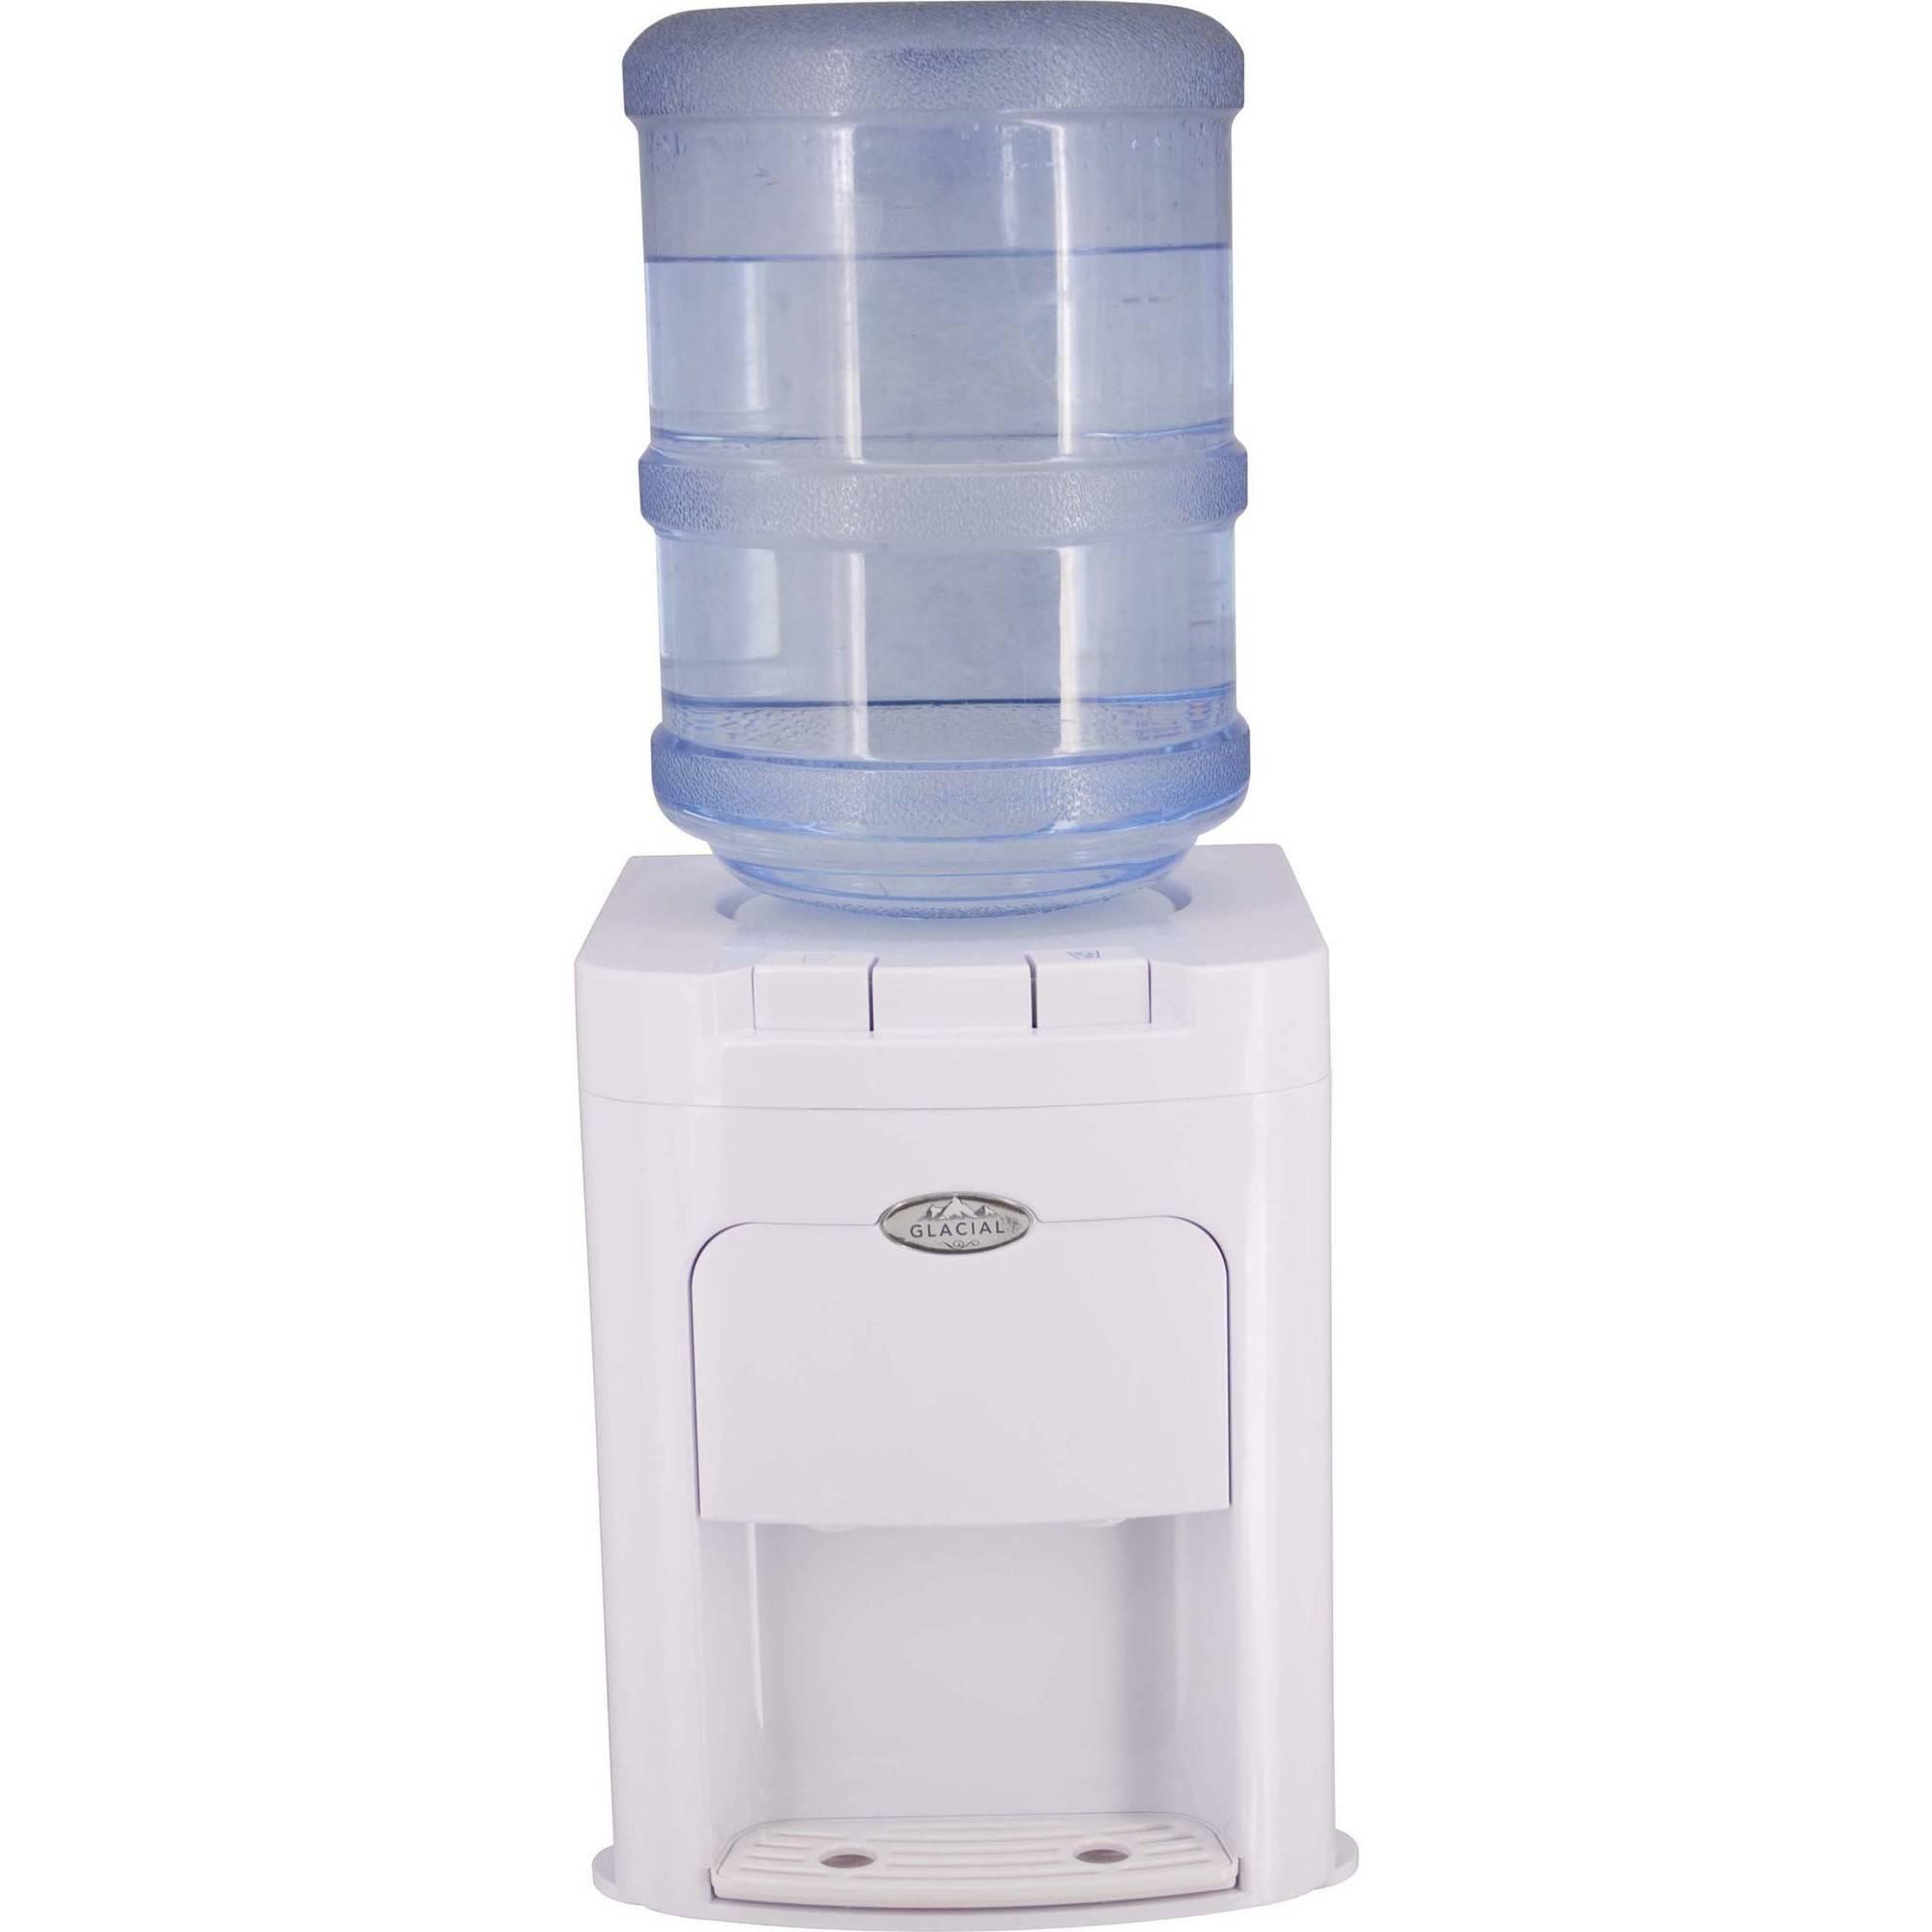 Glacial Maximum Cold Tabletop Watercooler for $29